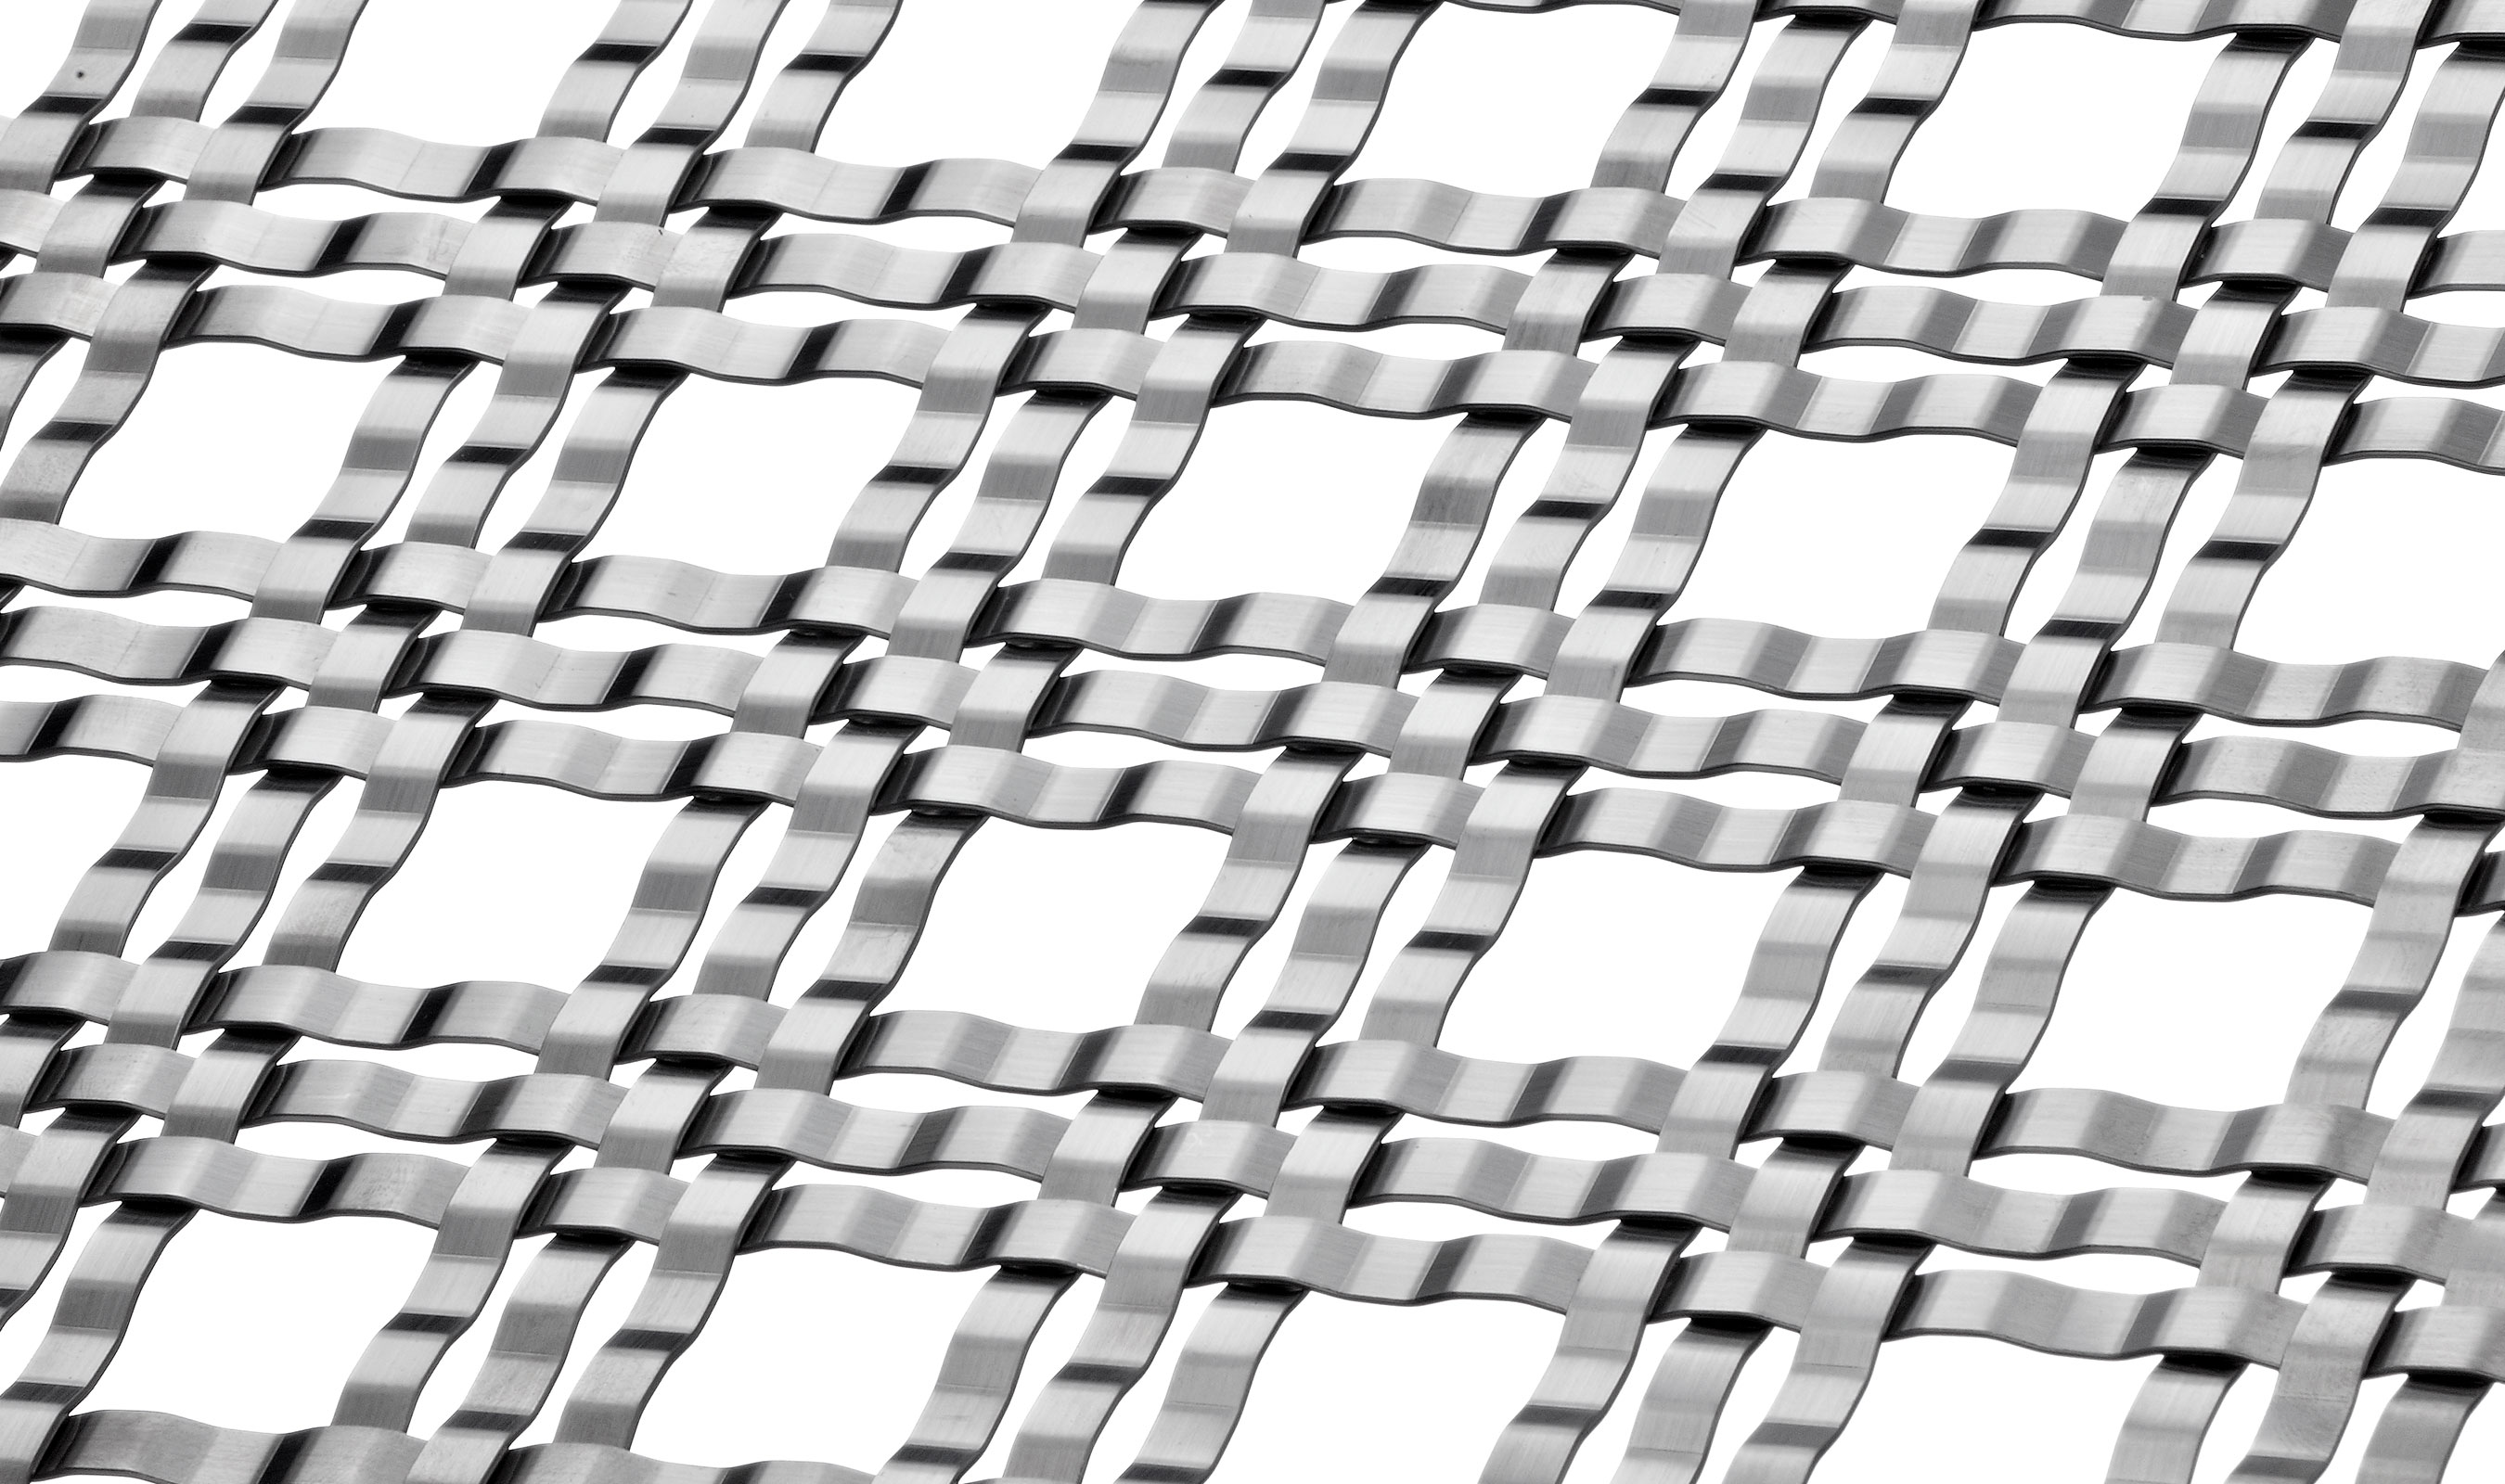 M33-5 Architectural Wire Mesh